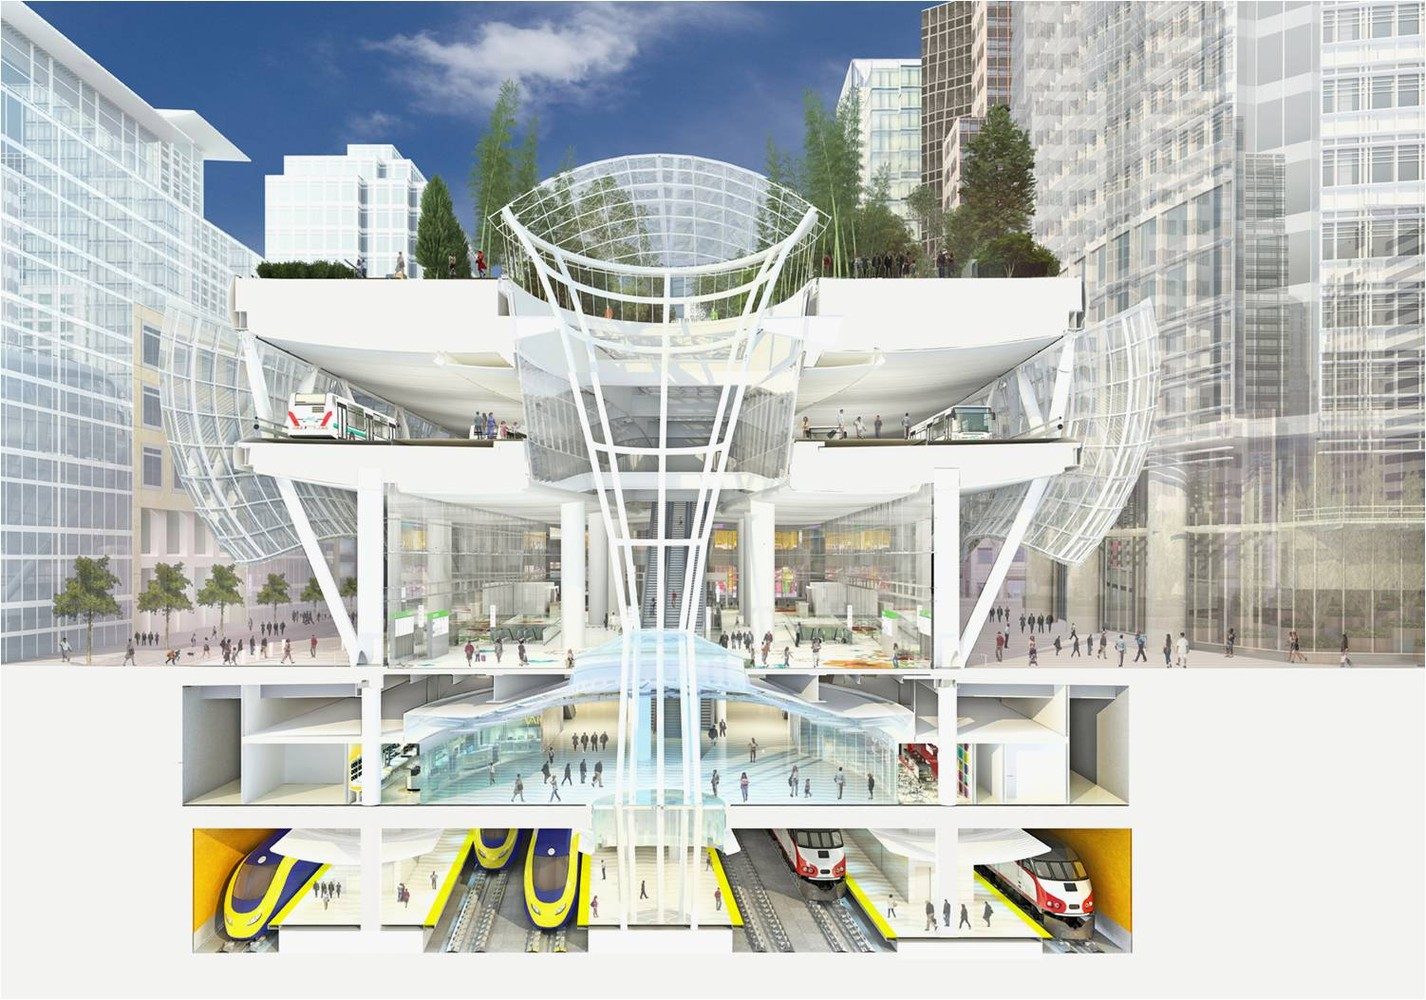 Rendering of Transbay Transit Center Grand Hall; project architect: Pelli Clarke Pelli. Image: Transbay Joint Powers Authority (TJPA)